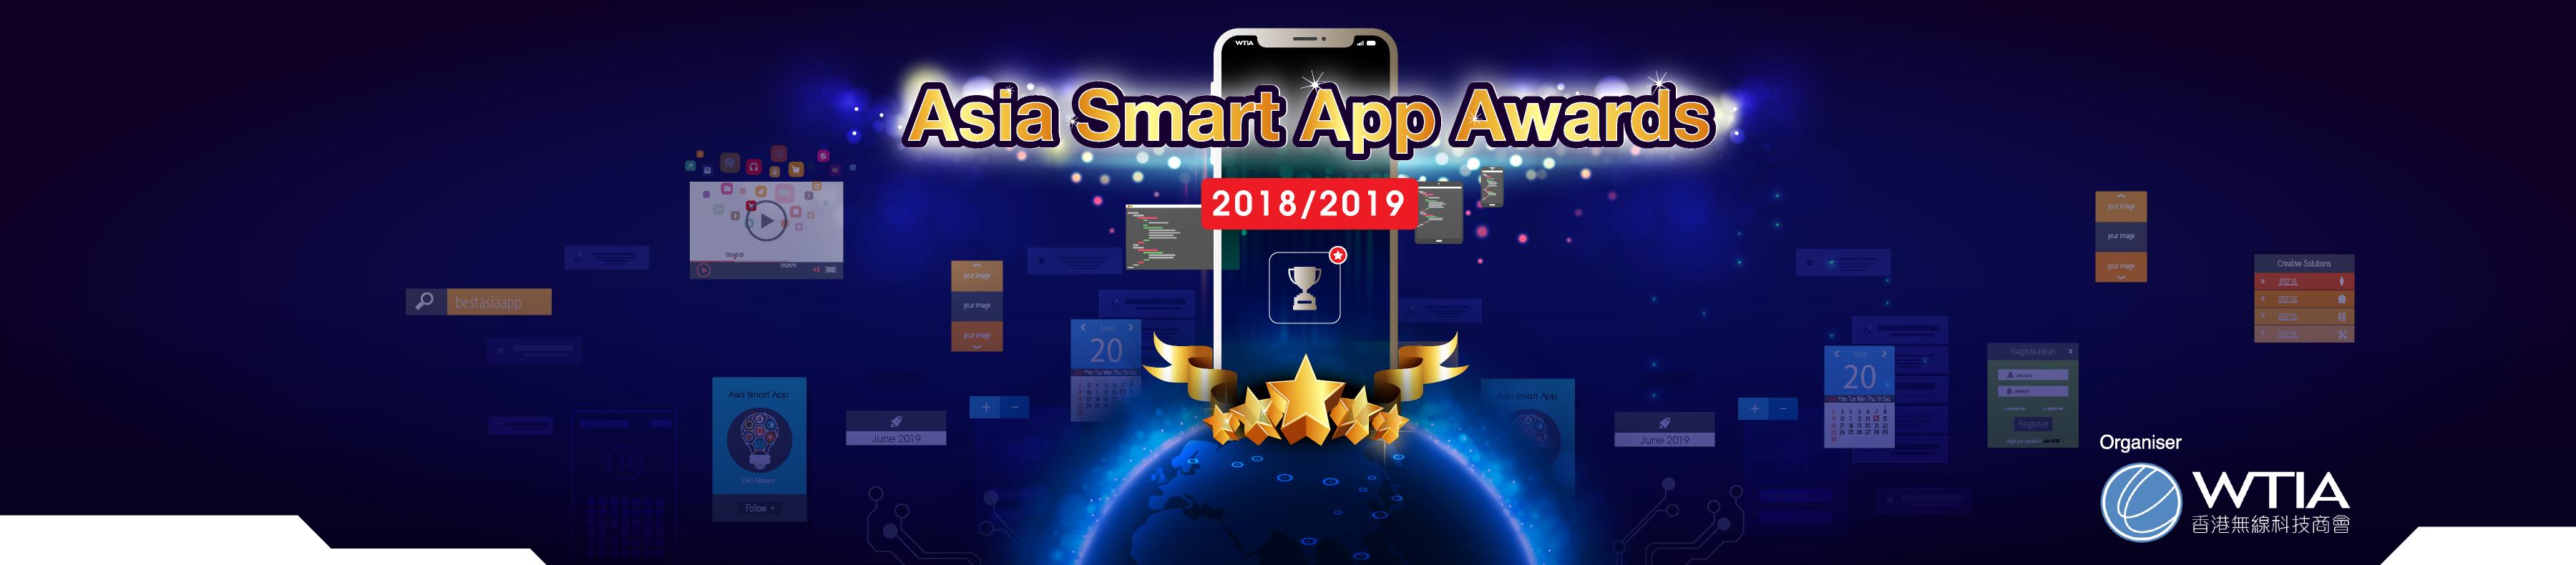 Asia Smart App Awards 2019 Certificate of Merit - eyes3 Sports Technology